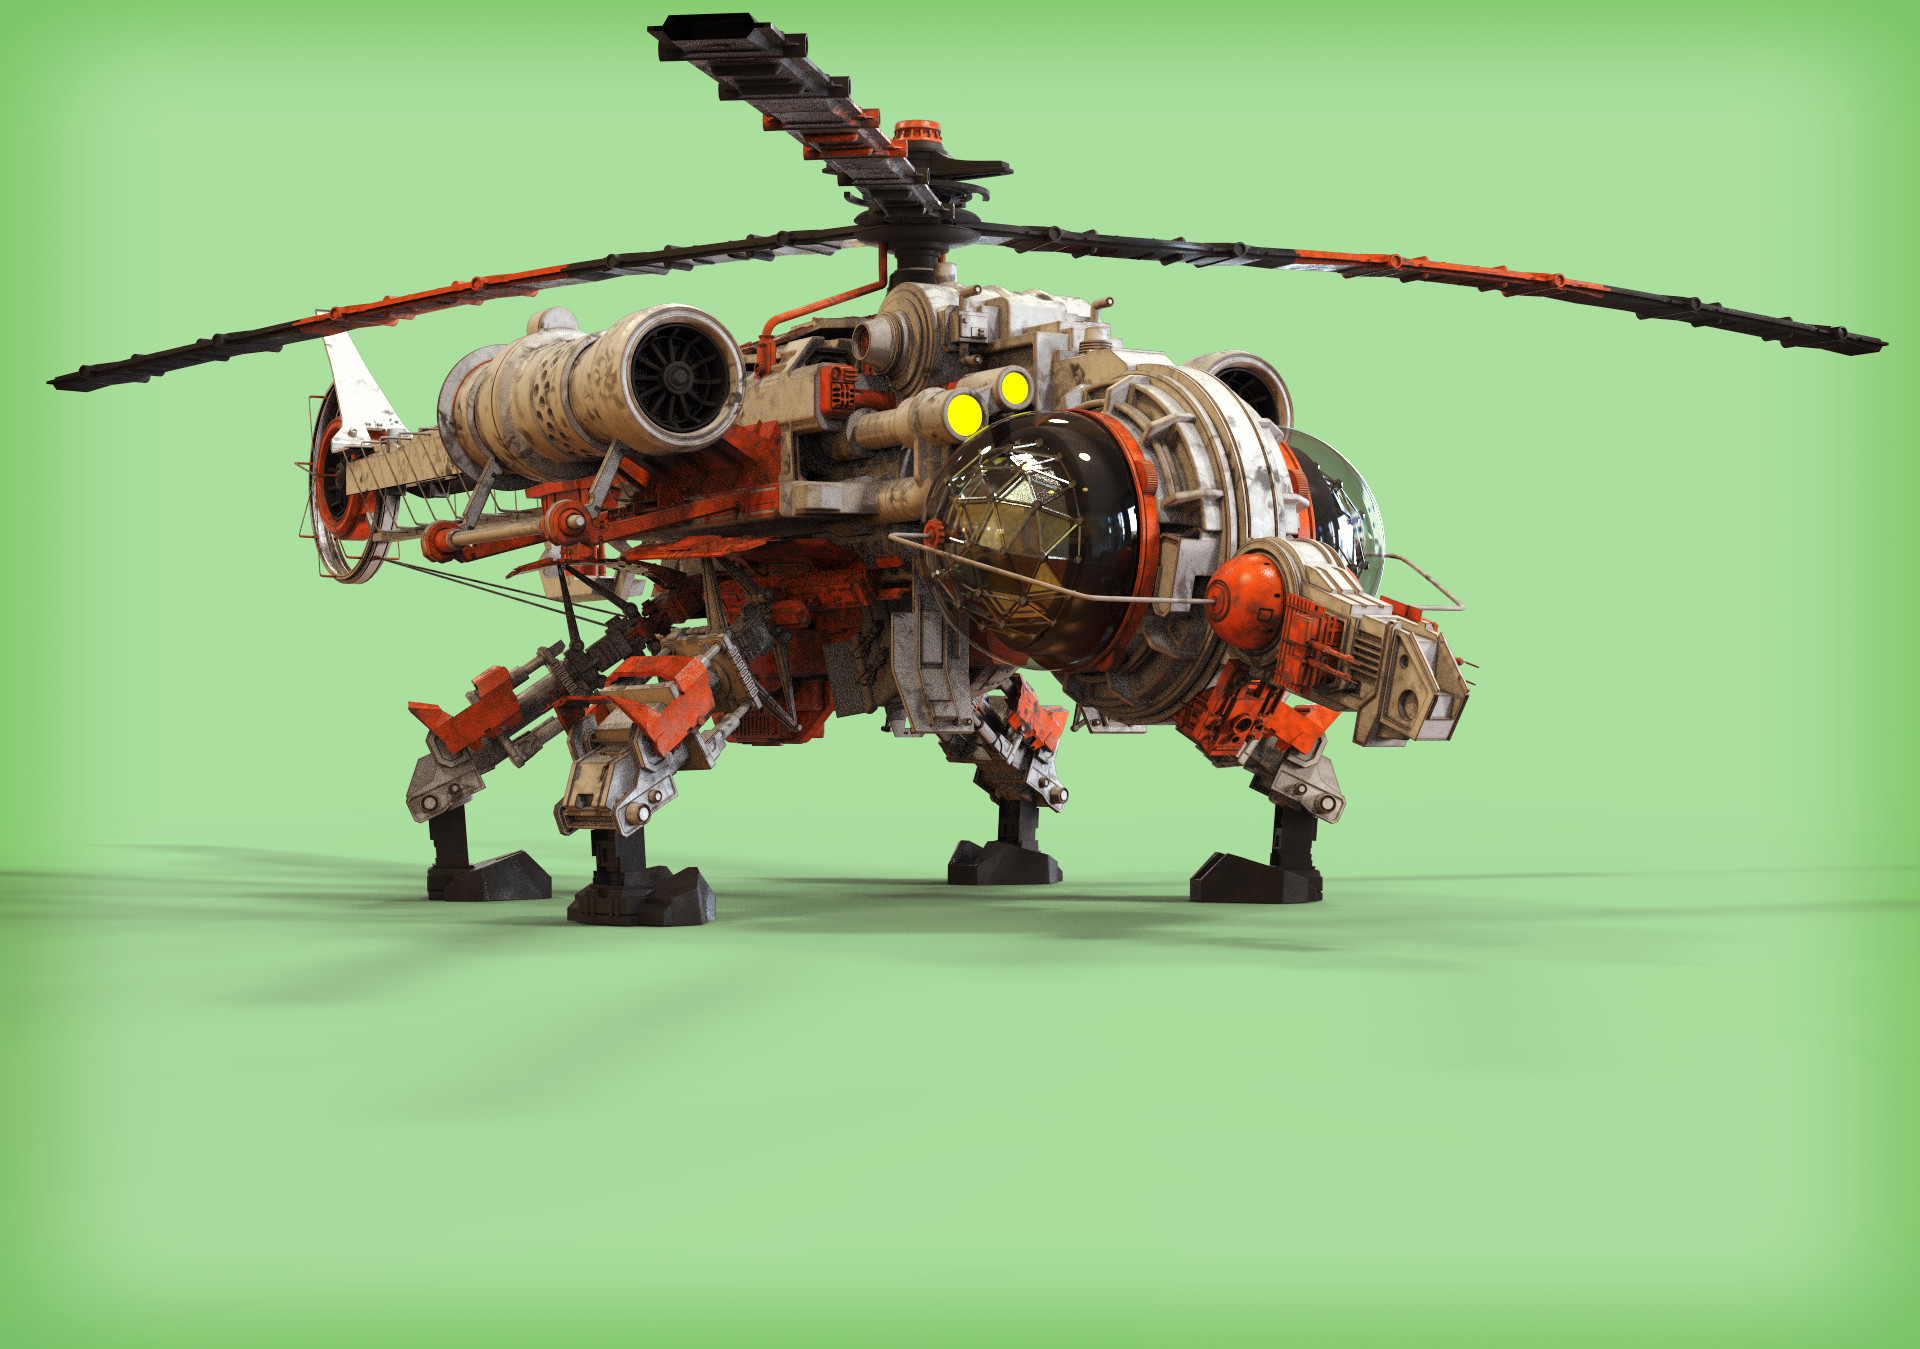 Ben nicholas bughelicopter 05